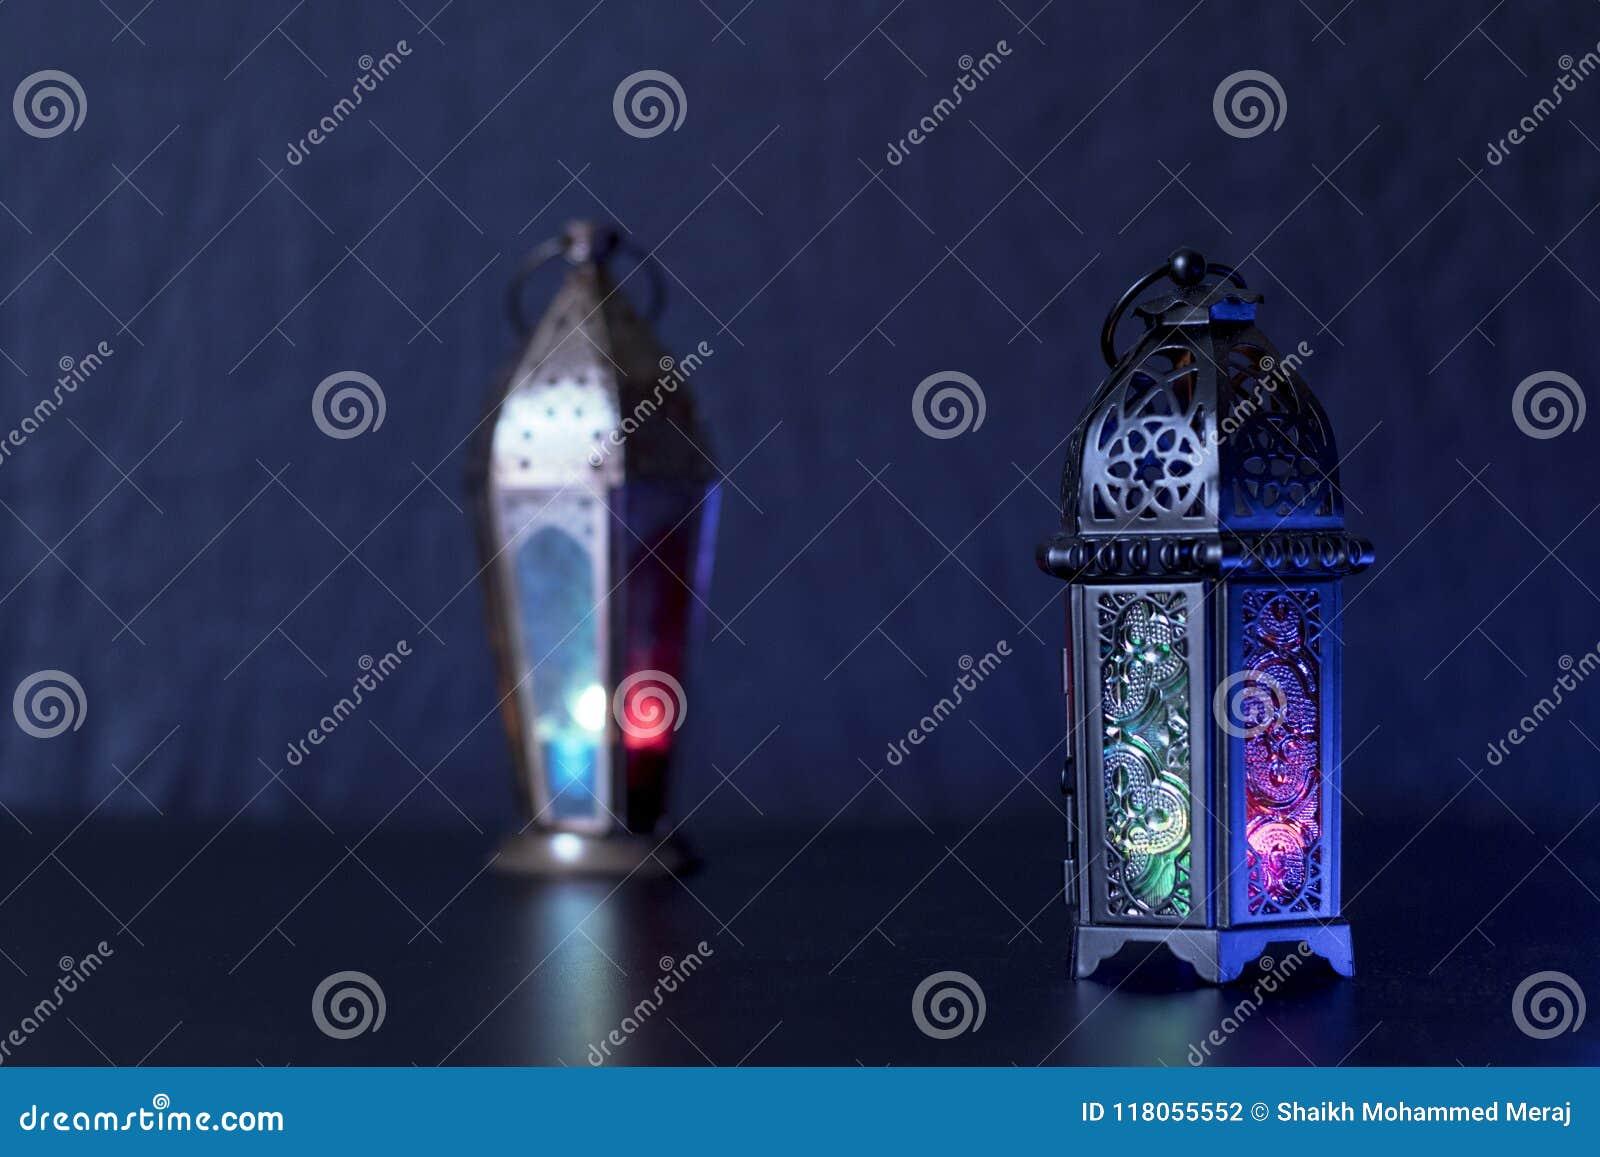 Ramadan Kareem and eid al fitr Lanterns Egyptian Fanoos